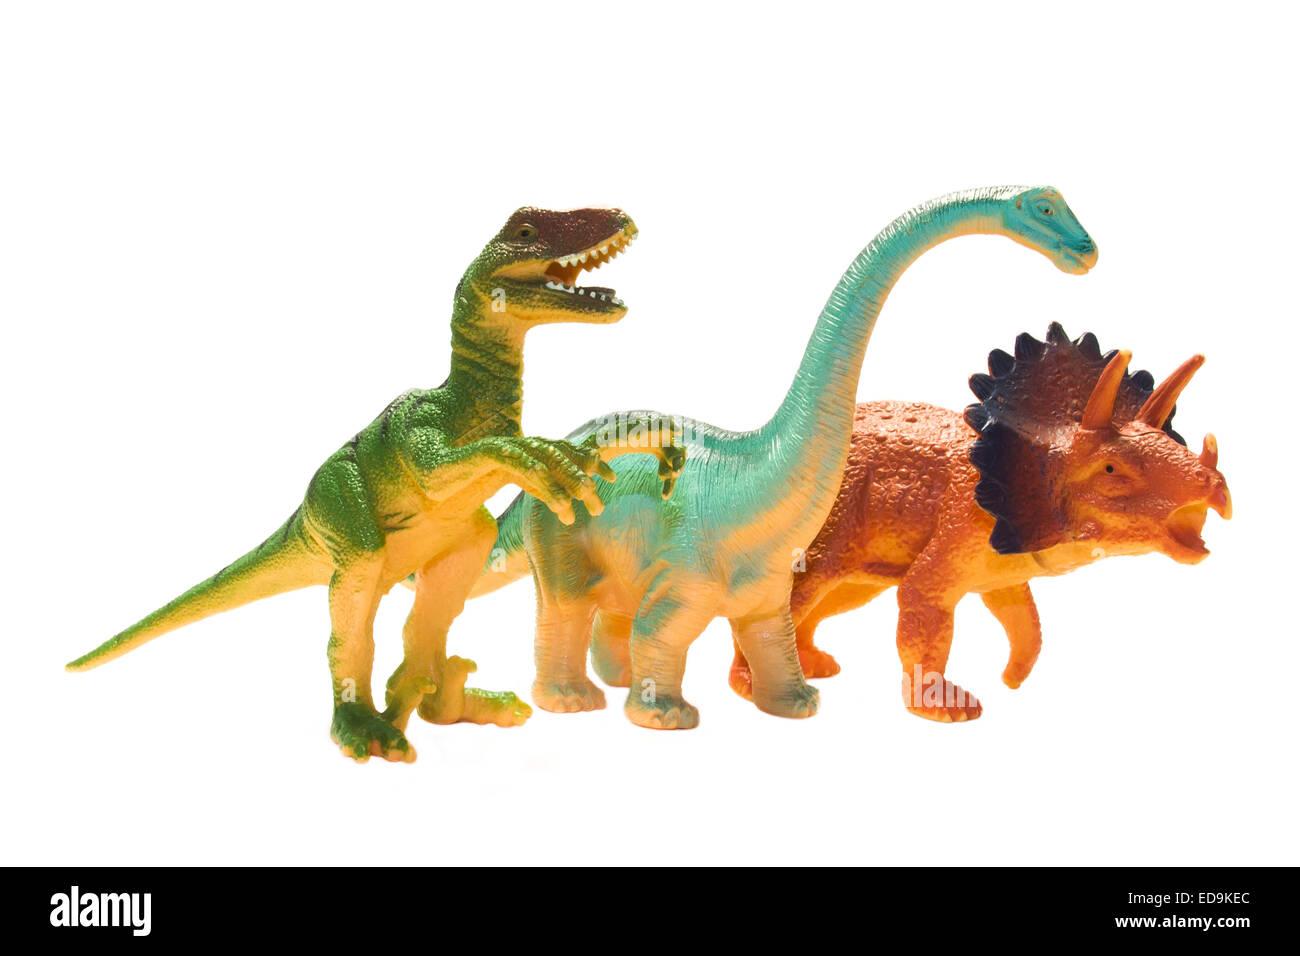 Dinosaur Figures on a white background isolated - Stock Image